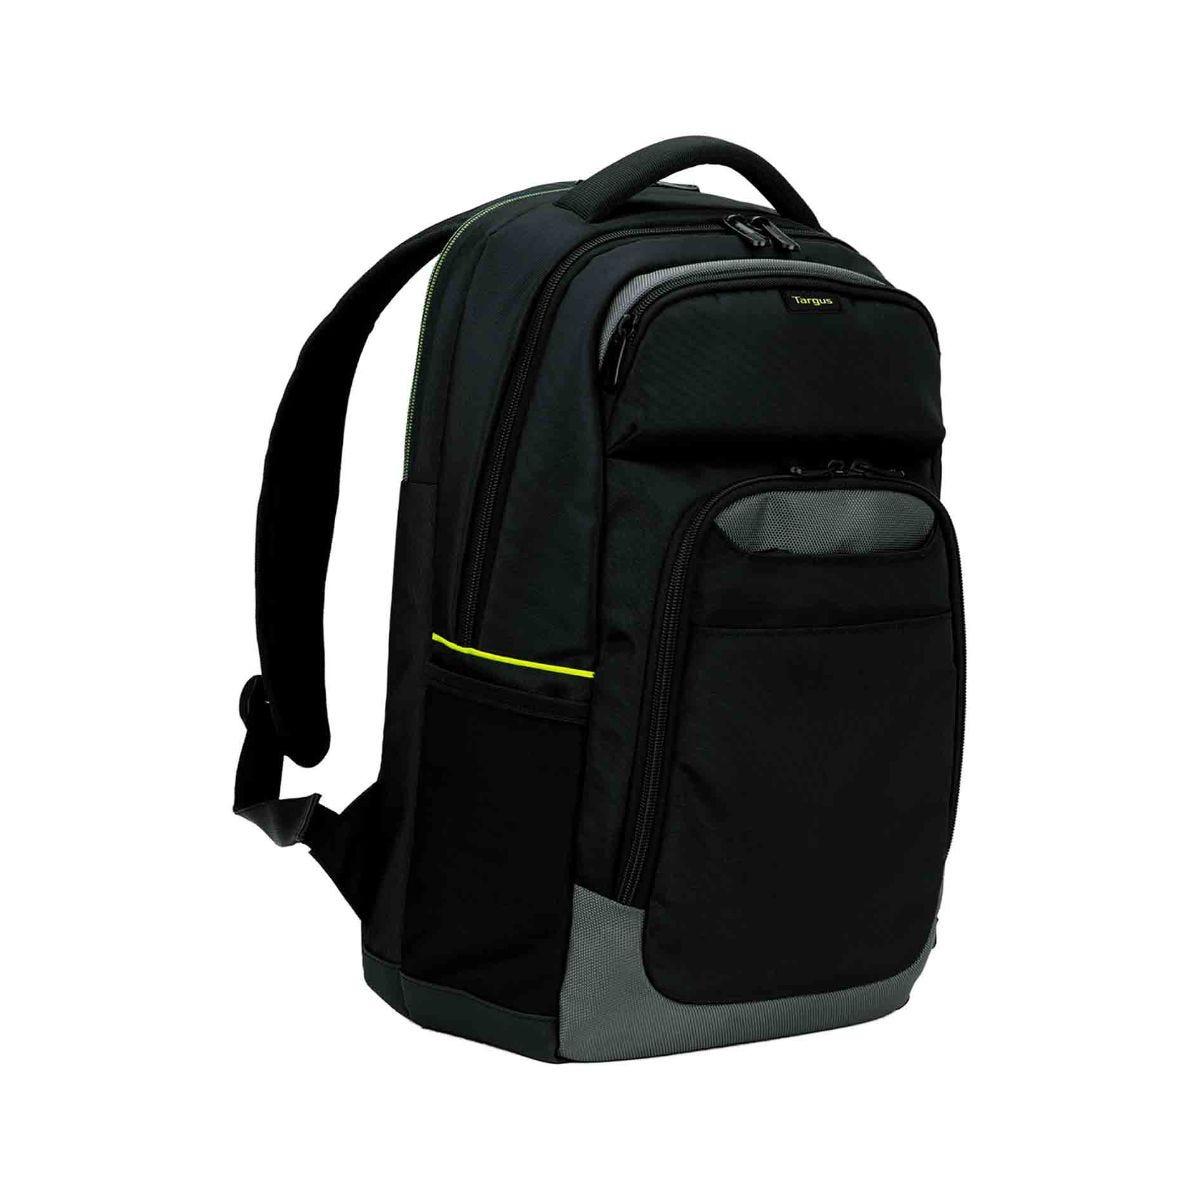 Multicoloured Backpacks   Holdalls Bags   Luggage Stationery - Ryman beba87cc6bd35